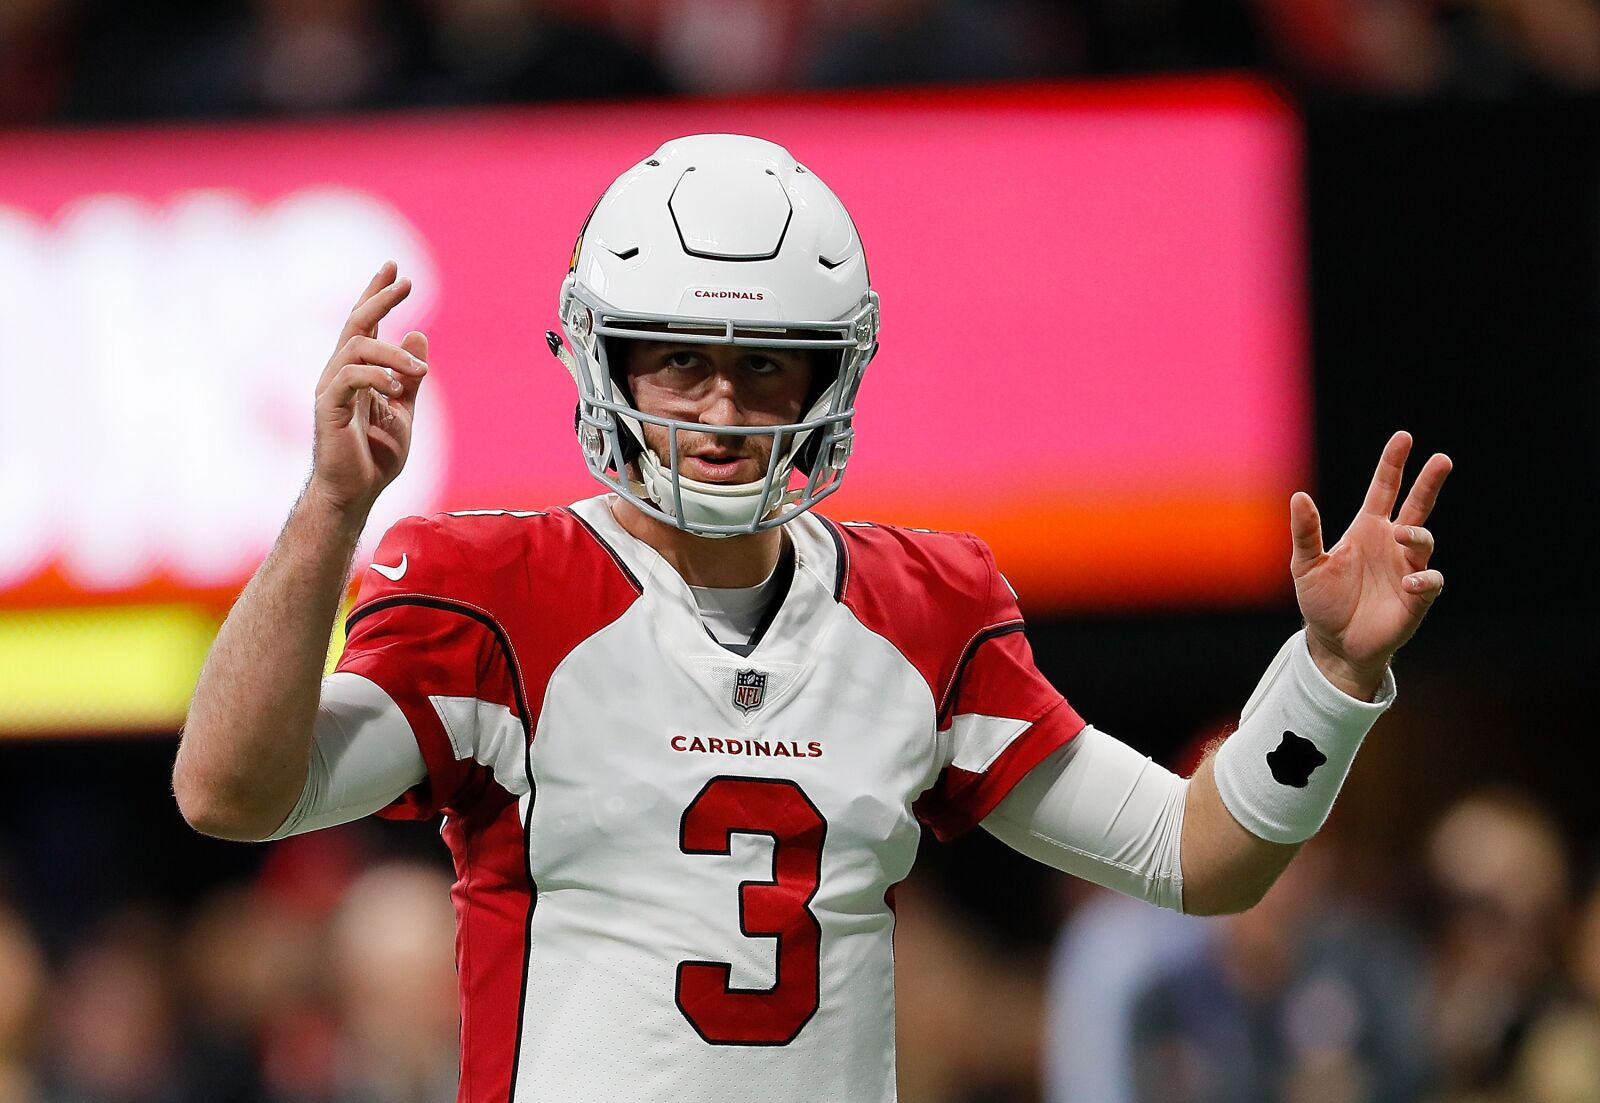 2019 NFL Draft: Arizona Cardinals three-round mock draft